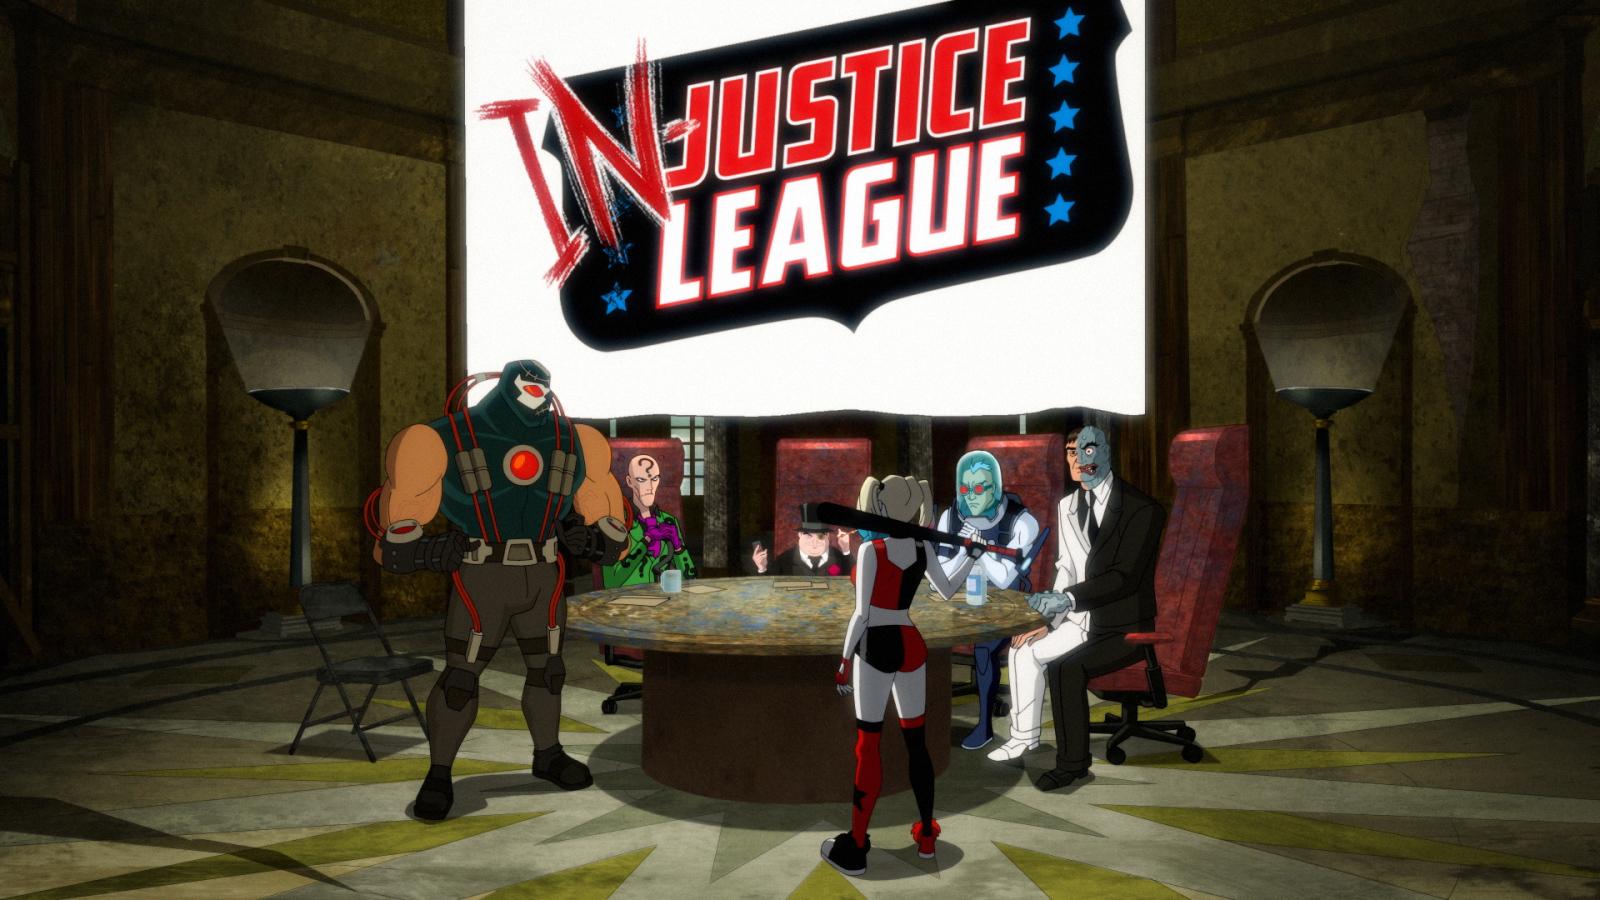 Harley Quinn S2E1 recap: Gotham is an Apocalyptic Wasteland